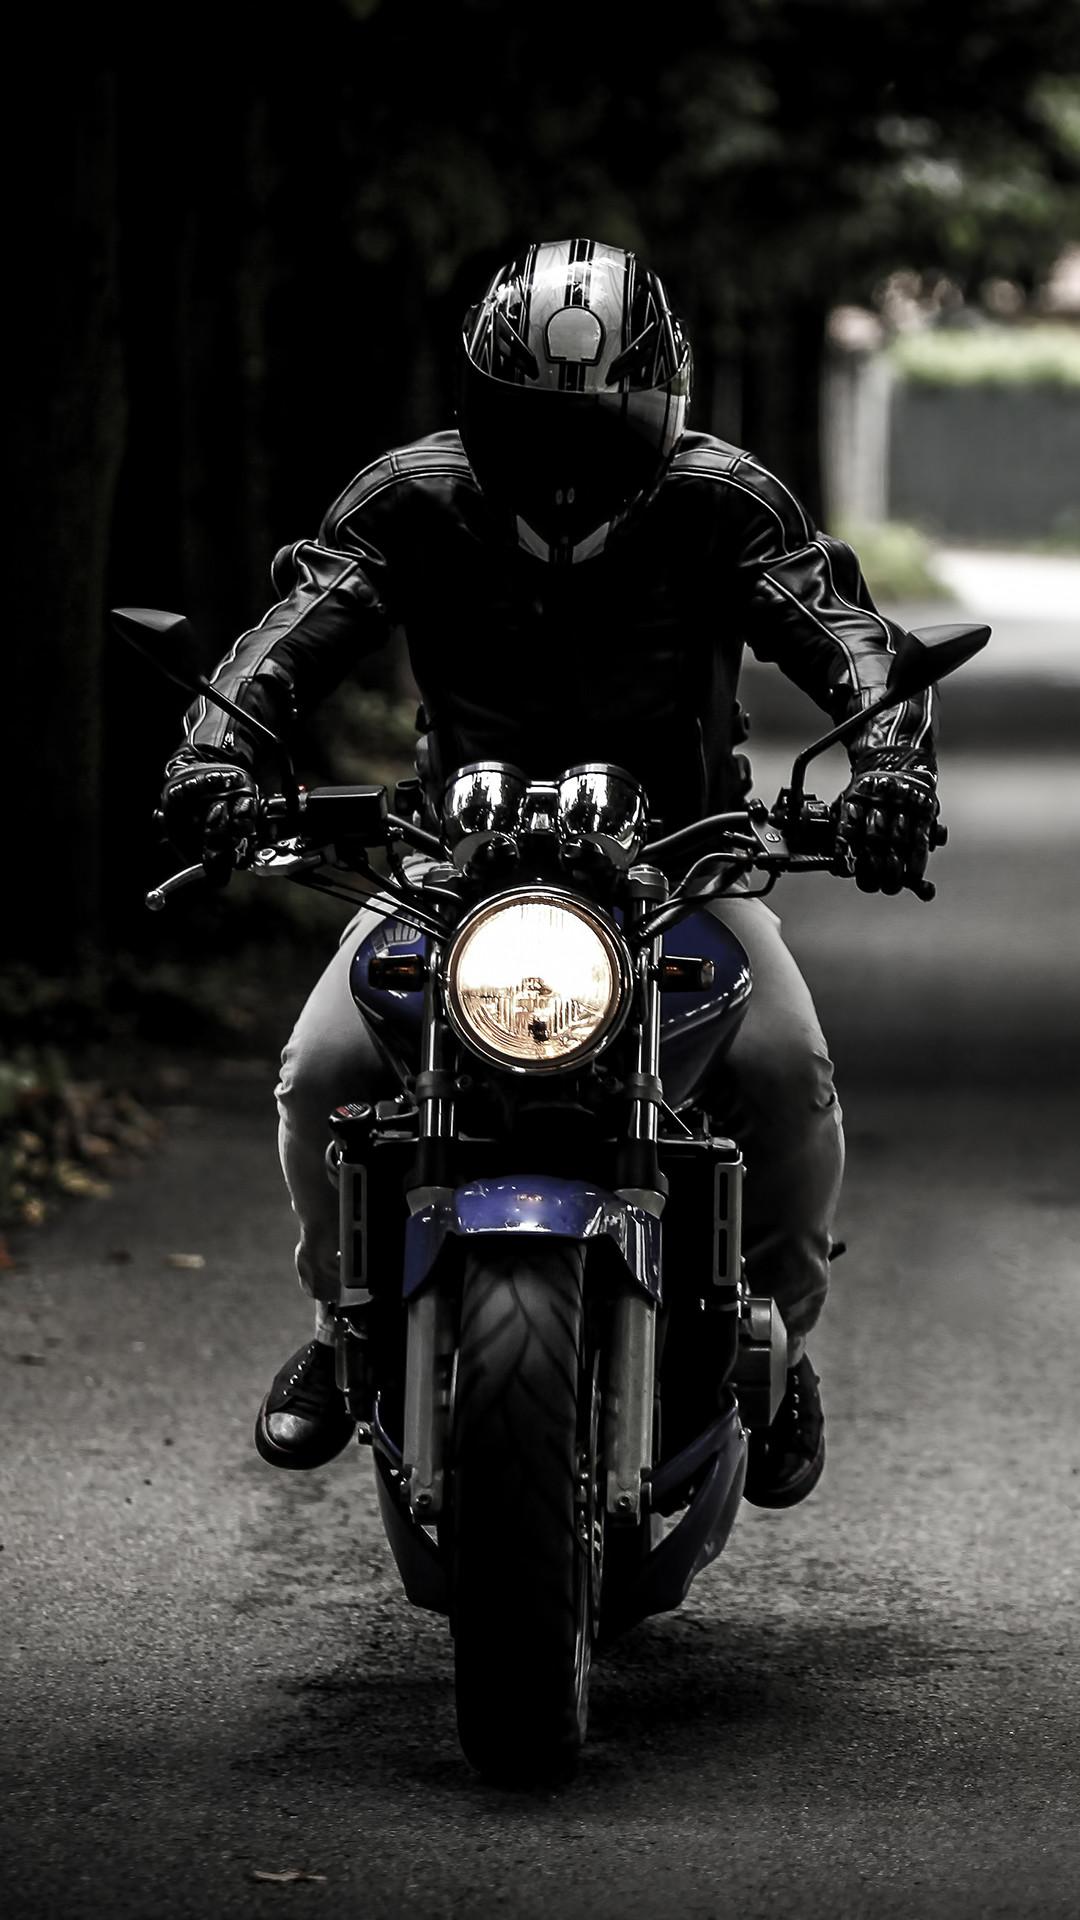 outlaw biker wallpaper (61+ images)